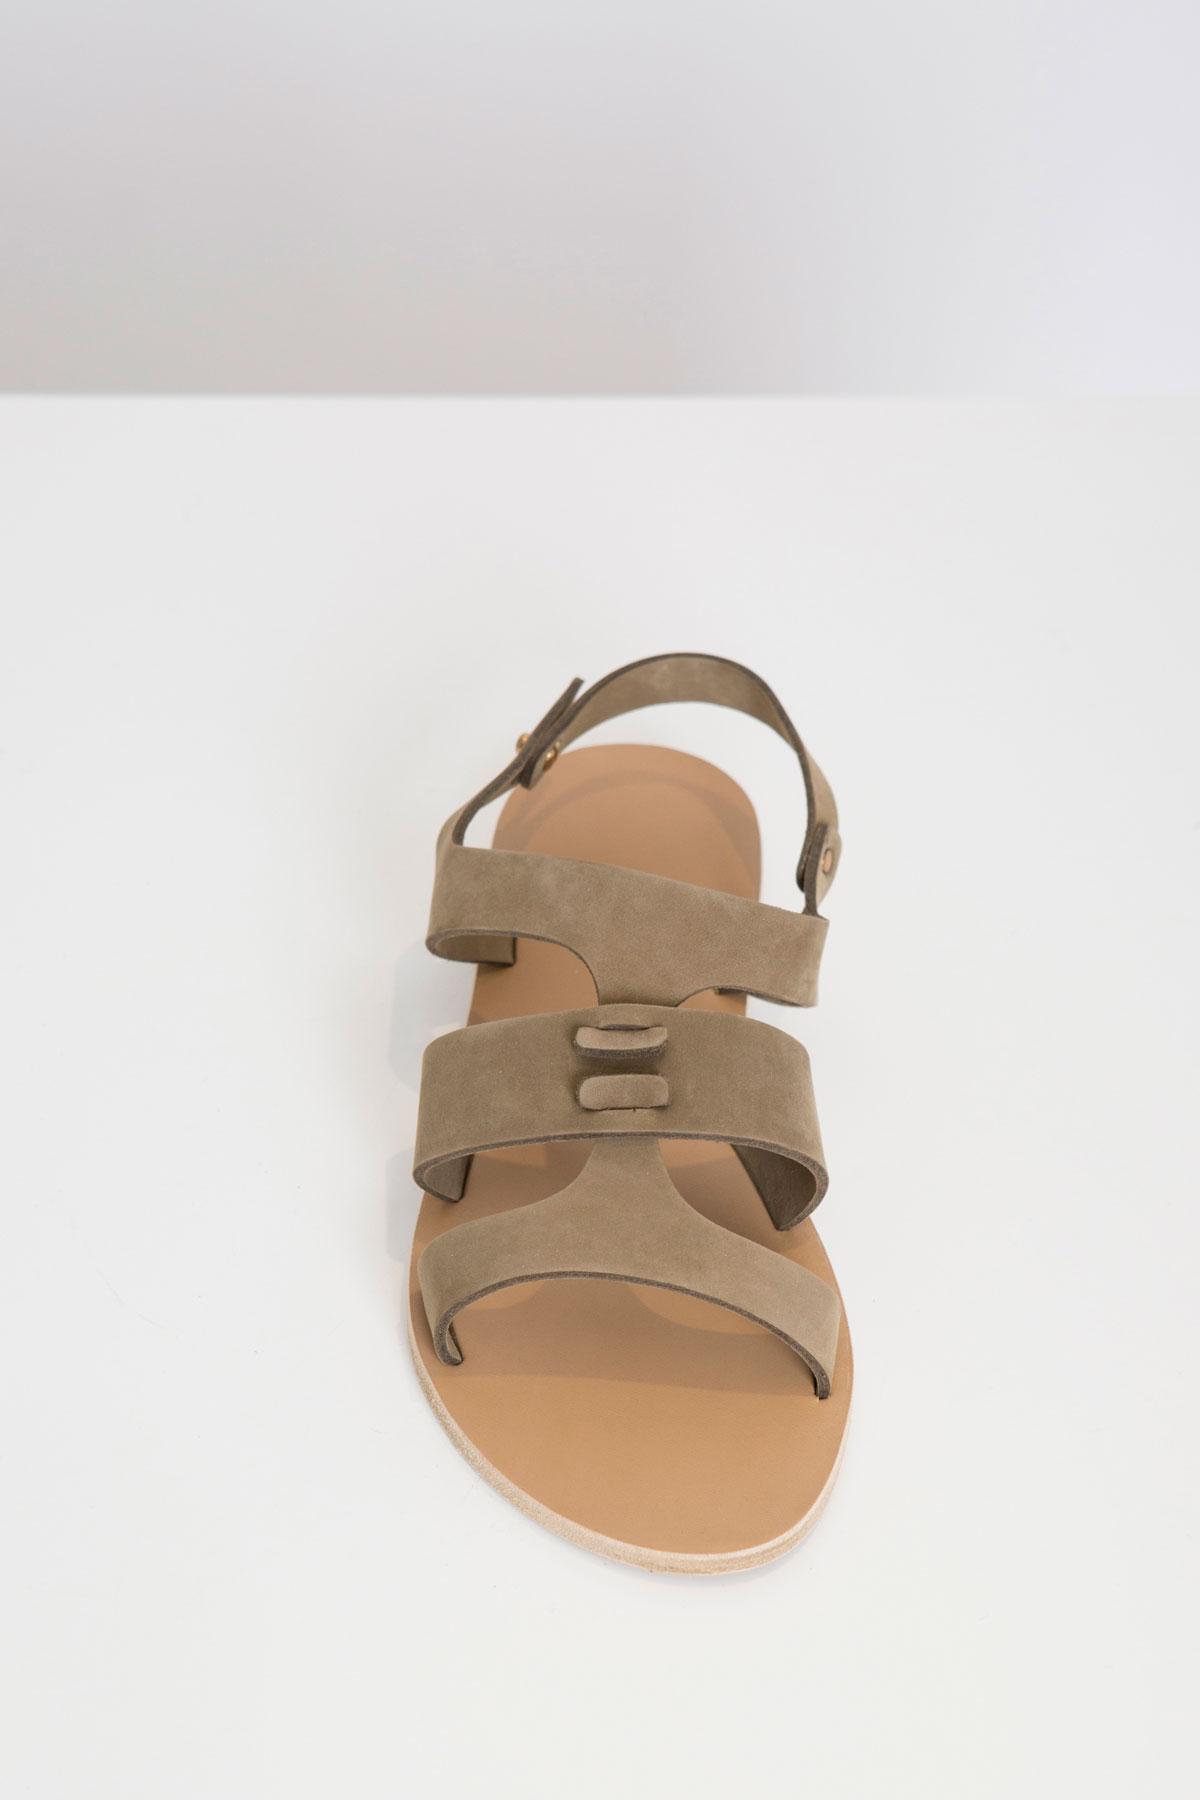 orient-sandals-greek-valia-gabriel-matchboxathens